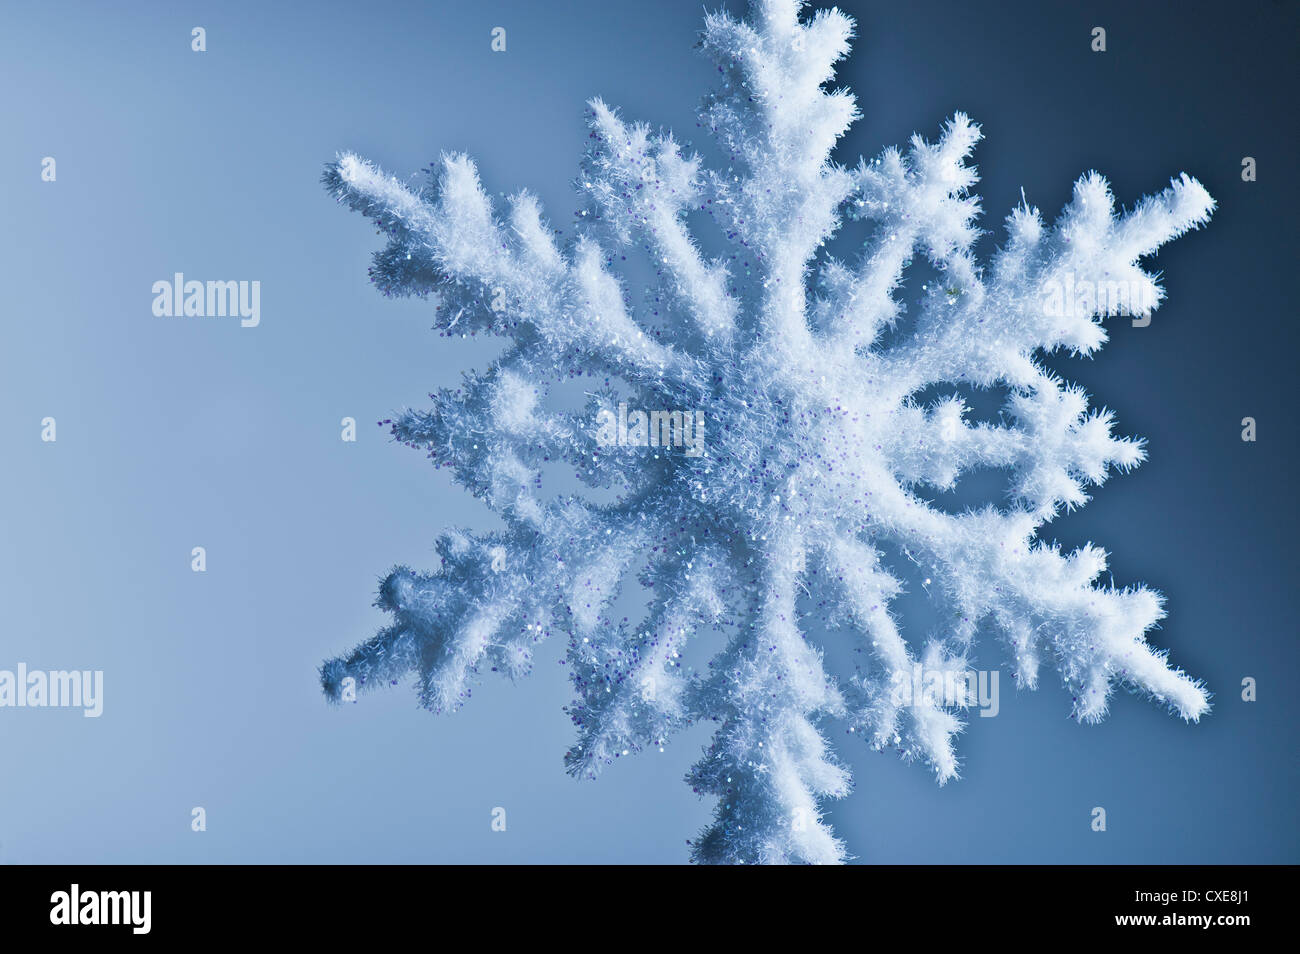 Snowflake decoration - Stock Image